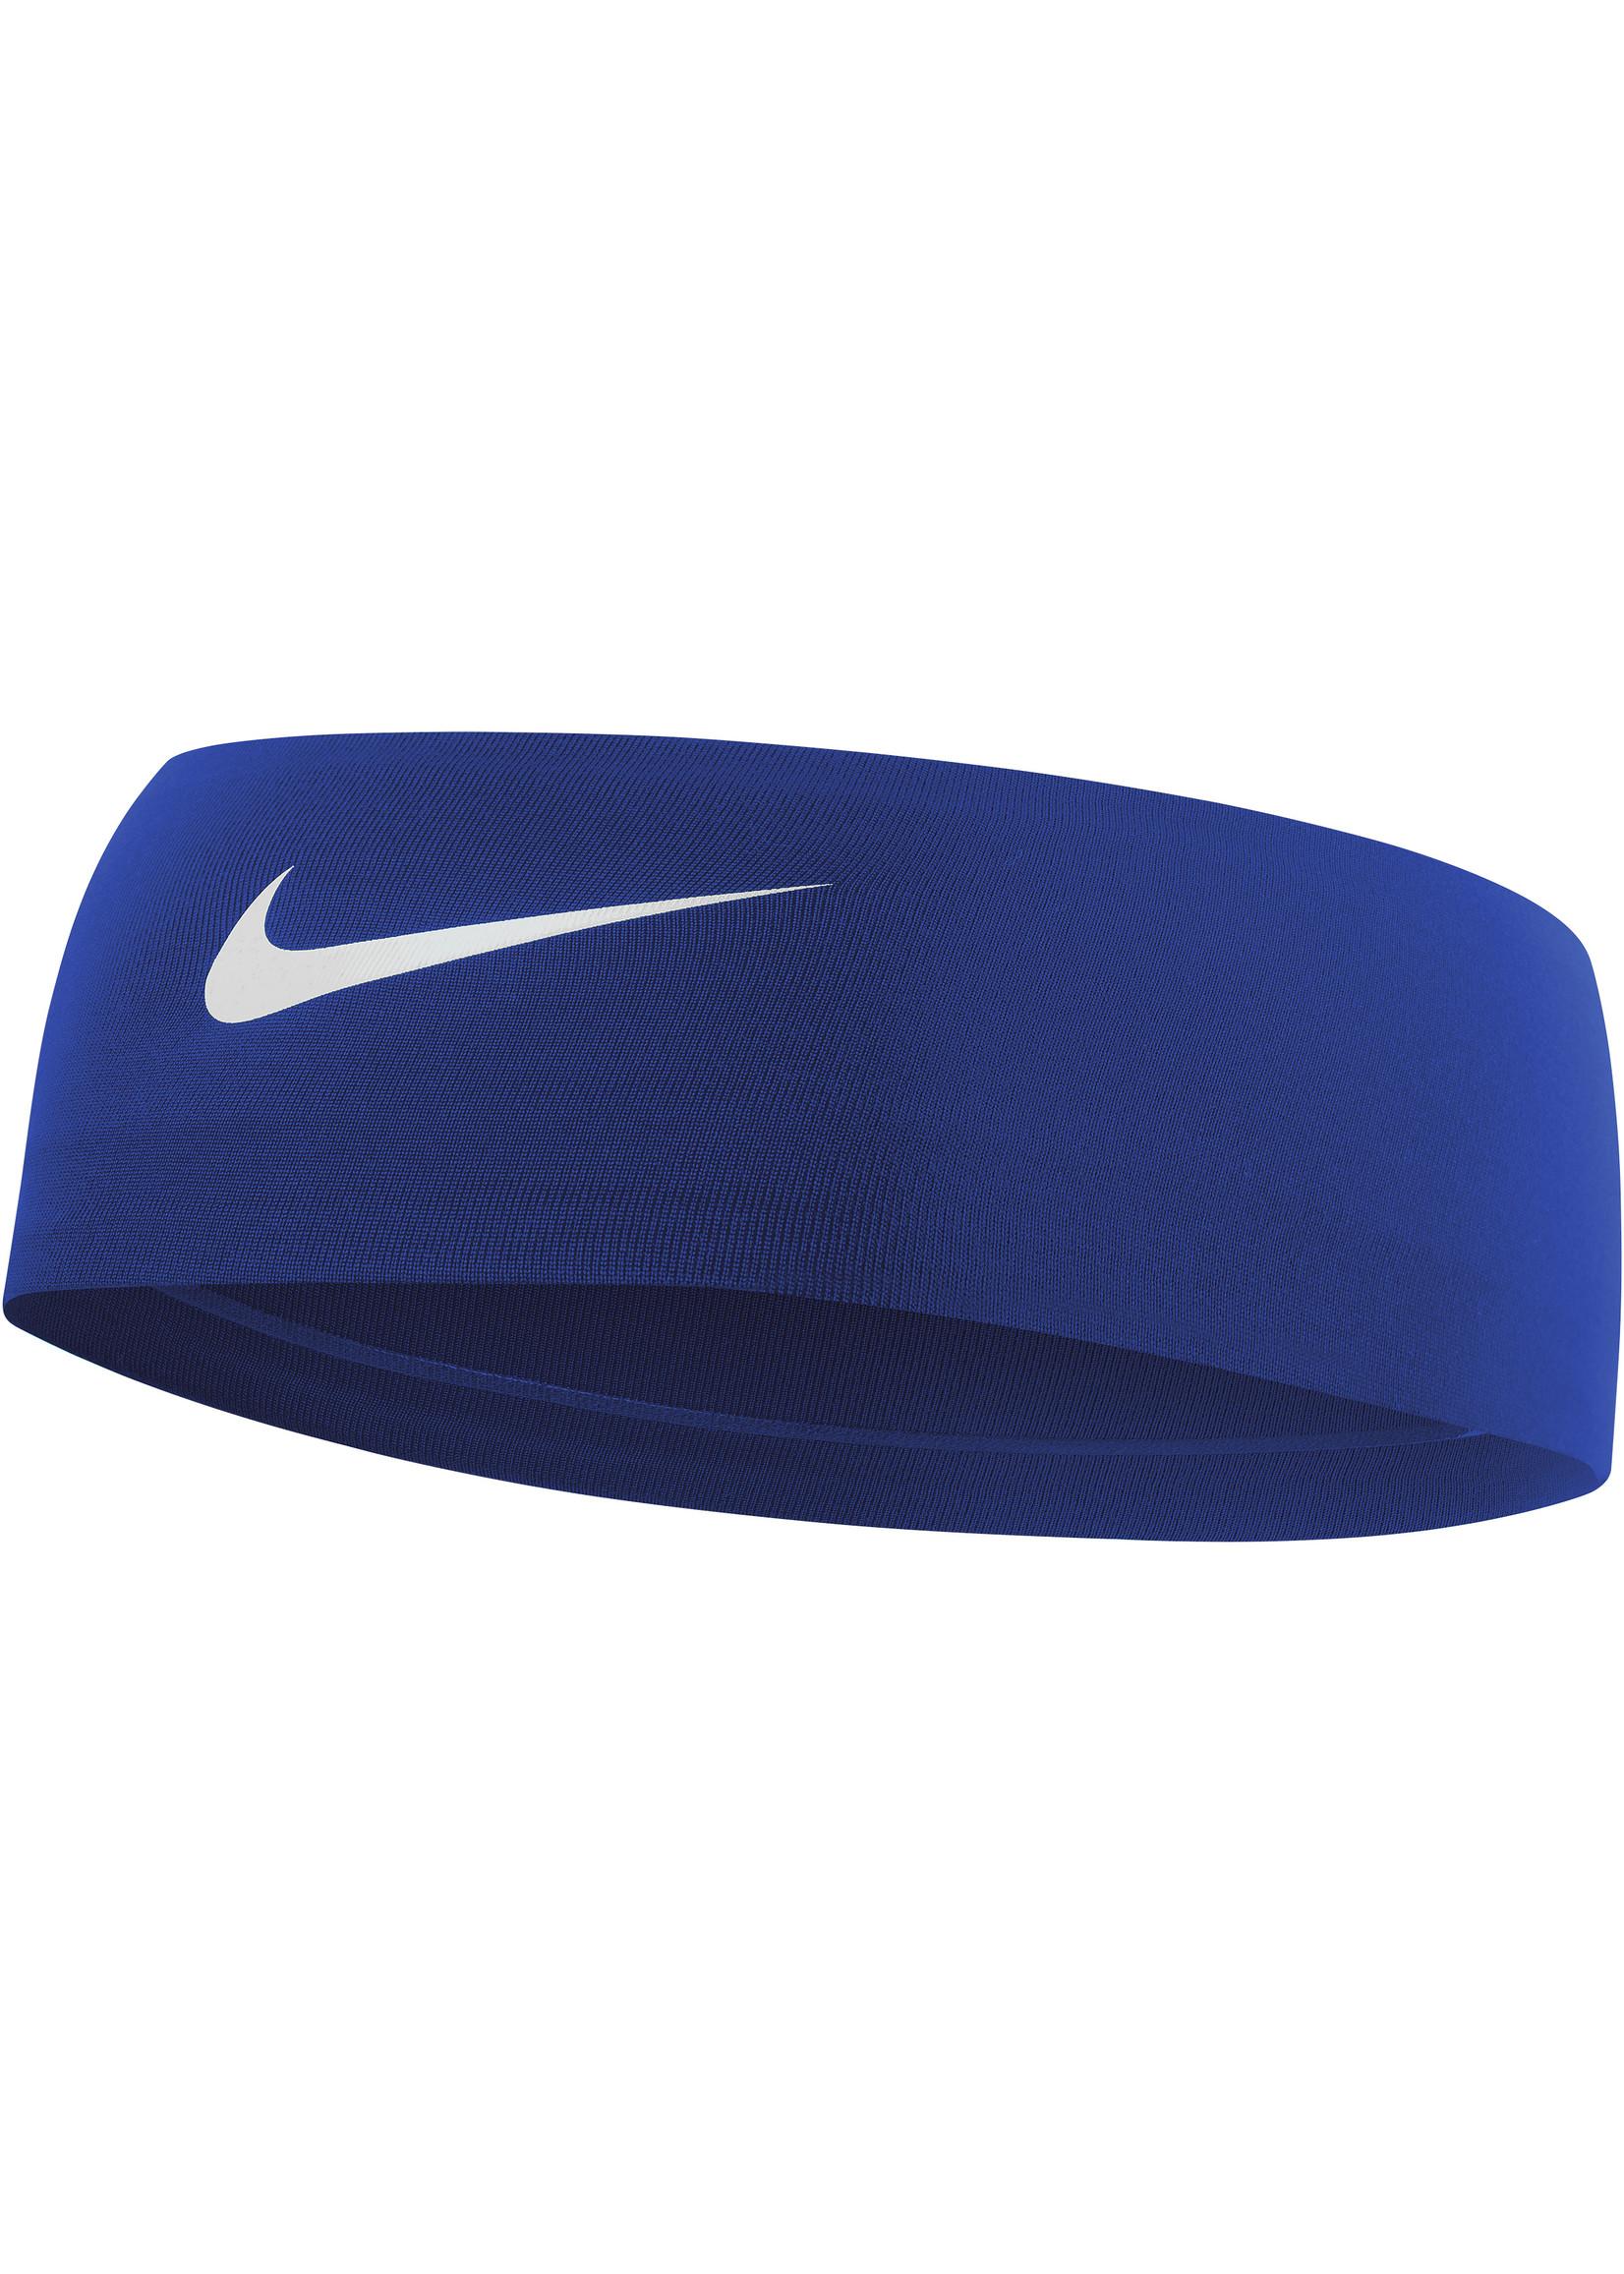 Nike Fury Headband 2.0 Game Royal/ White Youth